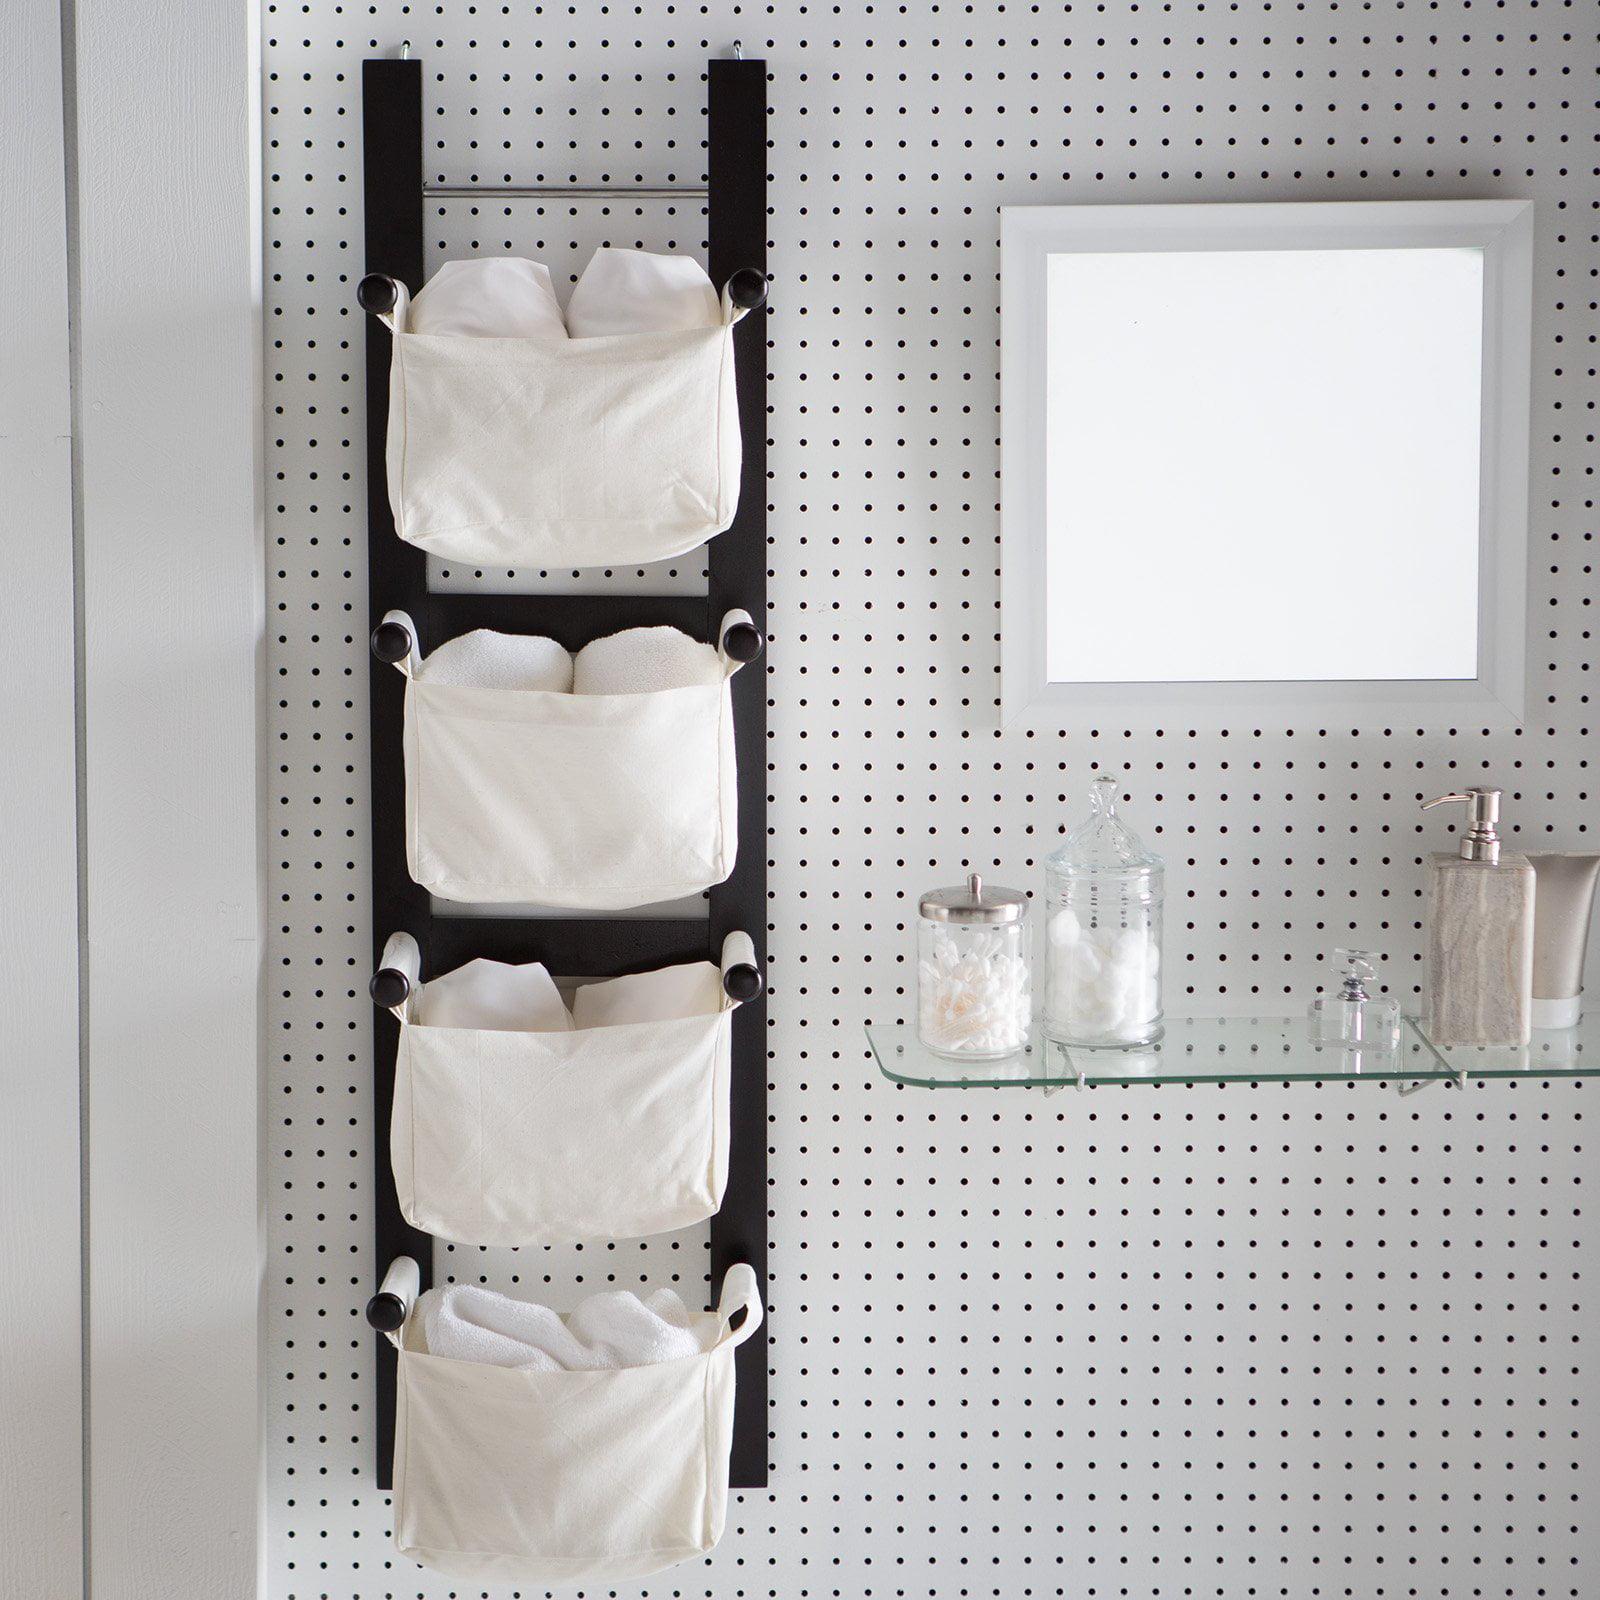 Storage/Magazine Rack With 4 Canvas Baskets   Walmart.com